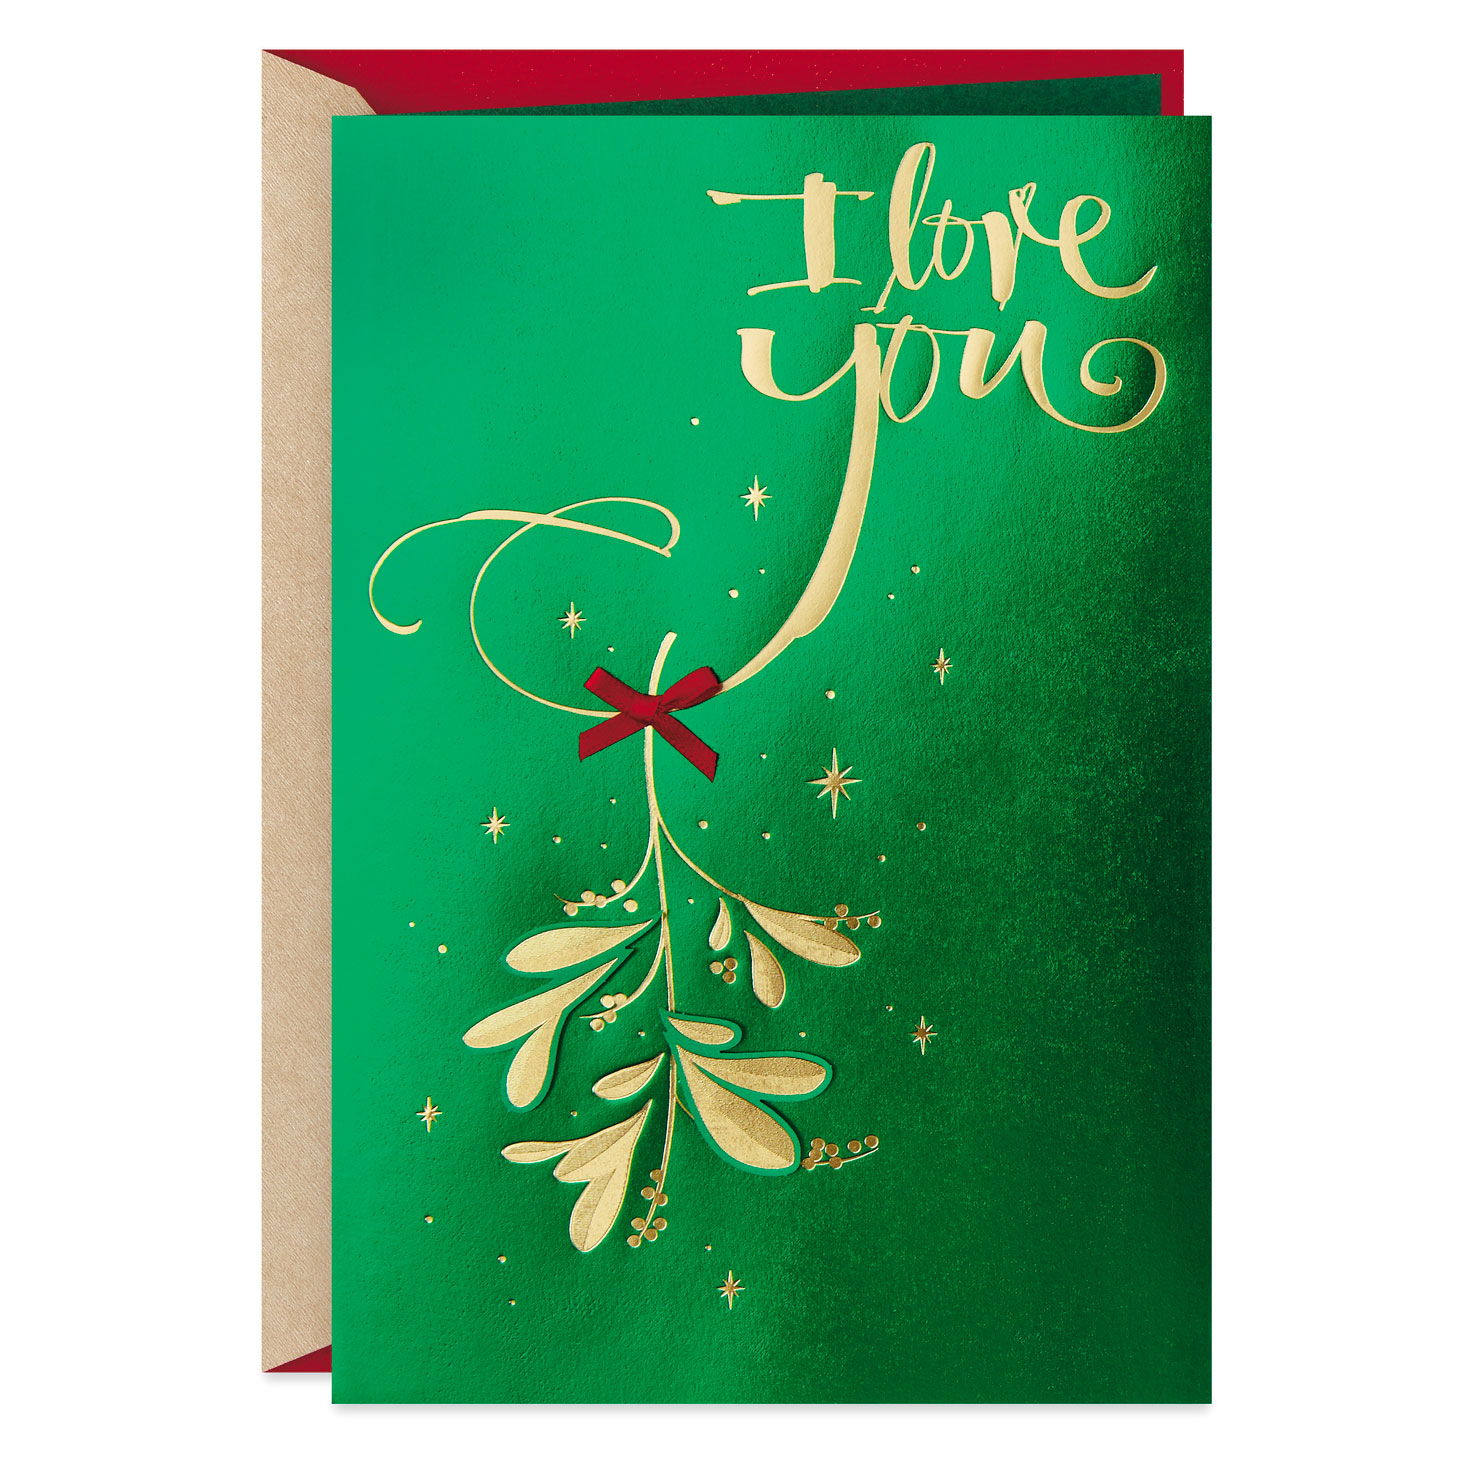 Mistletoe Love Christmas Card For Husband